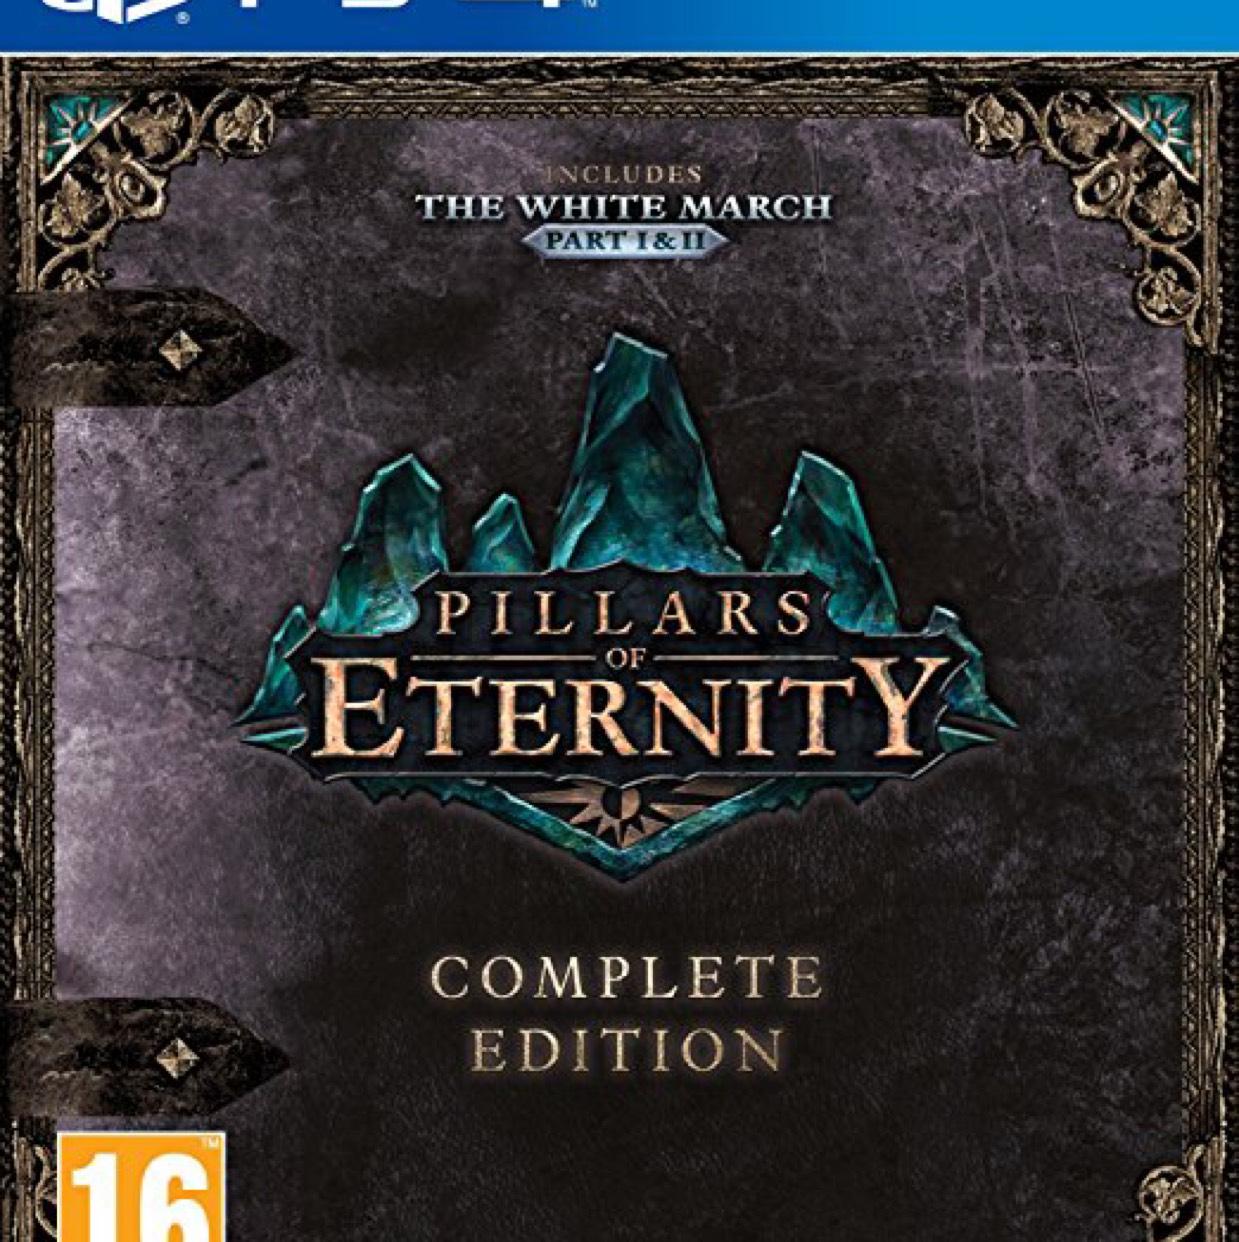 Pillars of Eternity Complete Edition £19.99 Amazon - Prime Exclusive